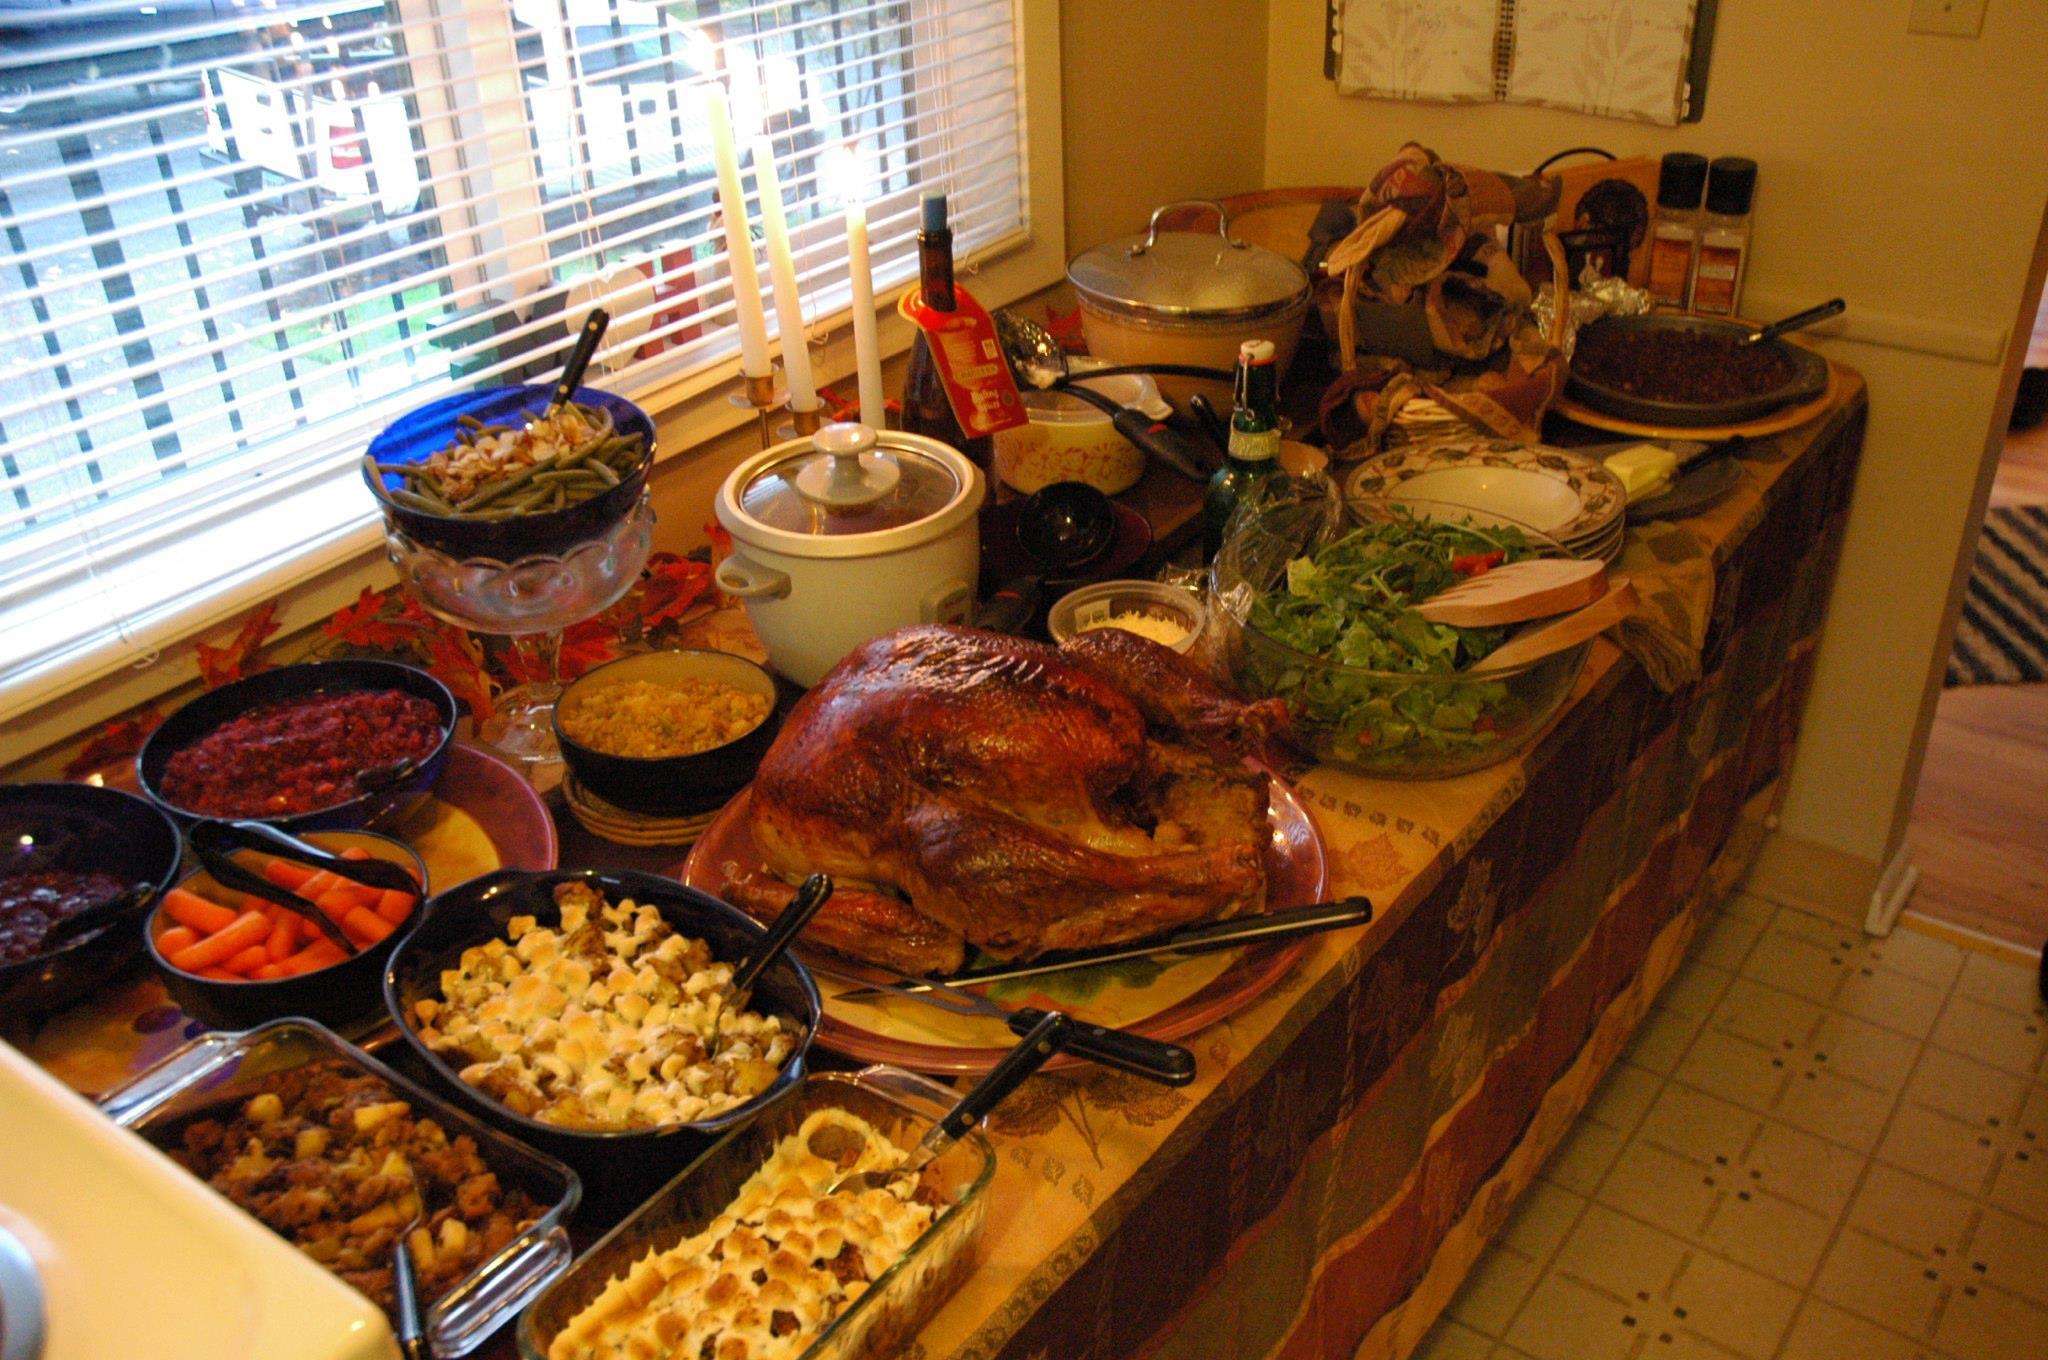 Cub Foods Thanksgiving Dinners  Thanksgiving Turkey Dinner